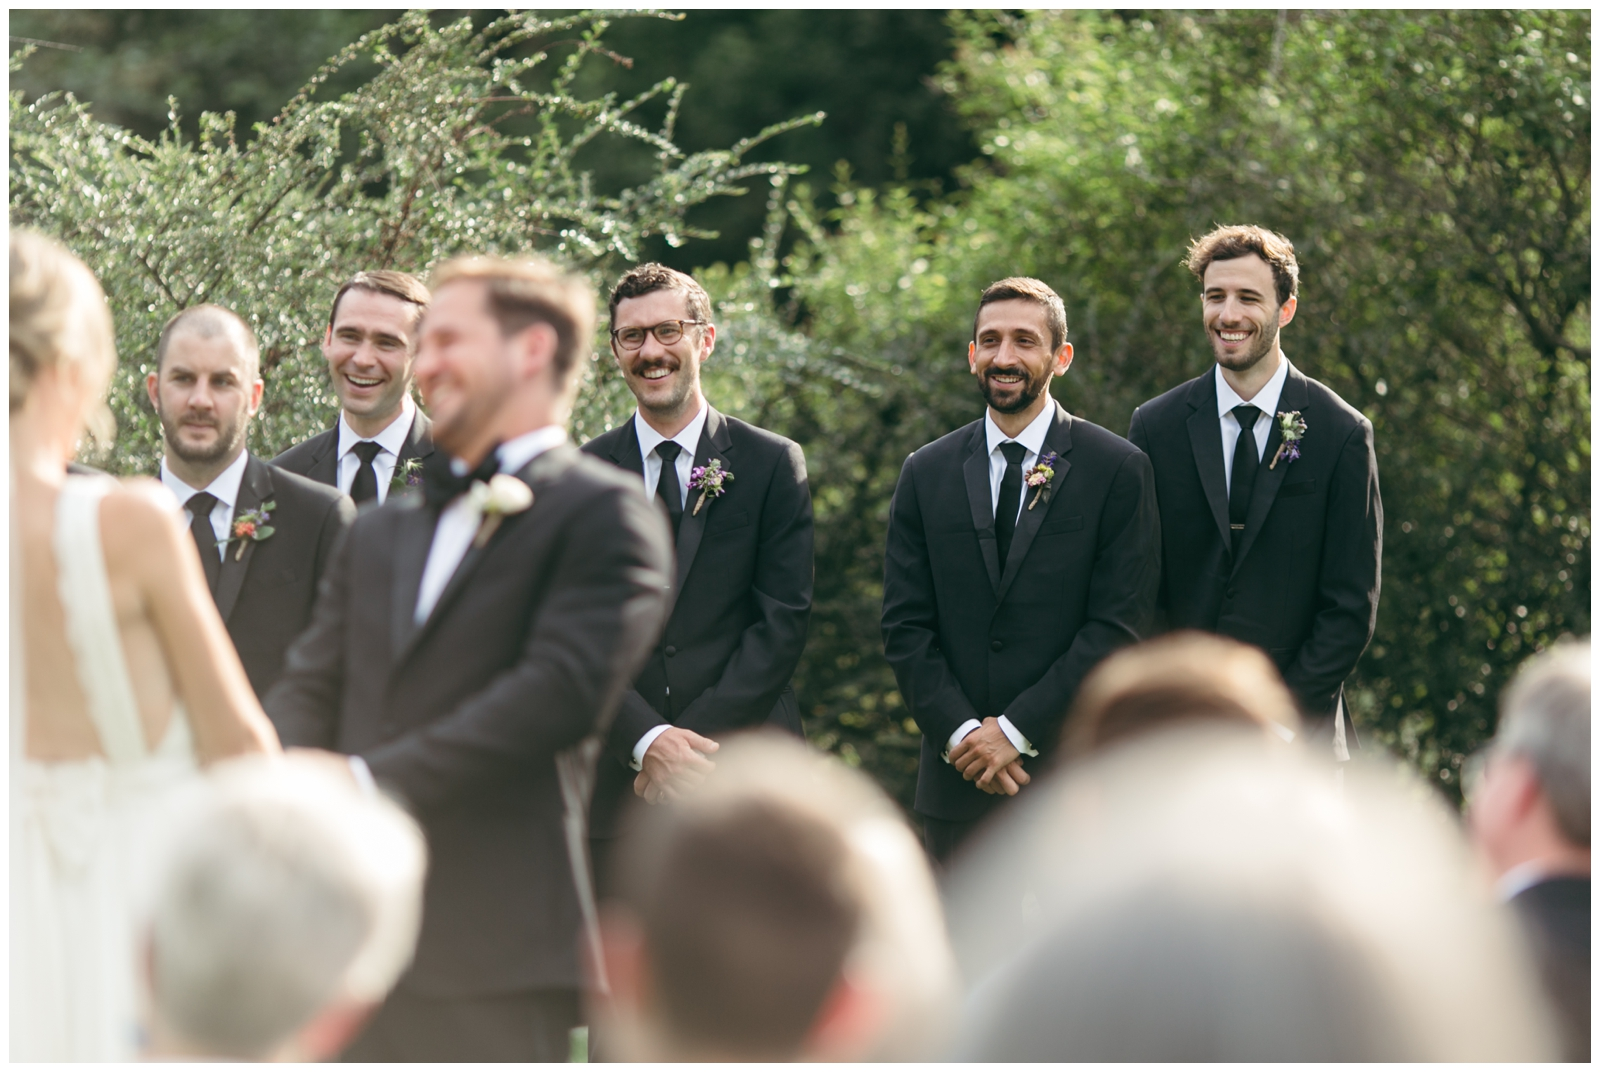 Moraine-Farm-wedding-Bailey-Q-Photo-Massachusetts-wedding-photpgrapher-071.jpg